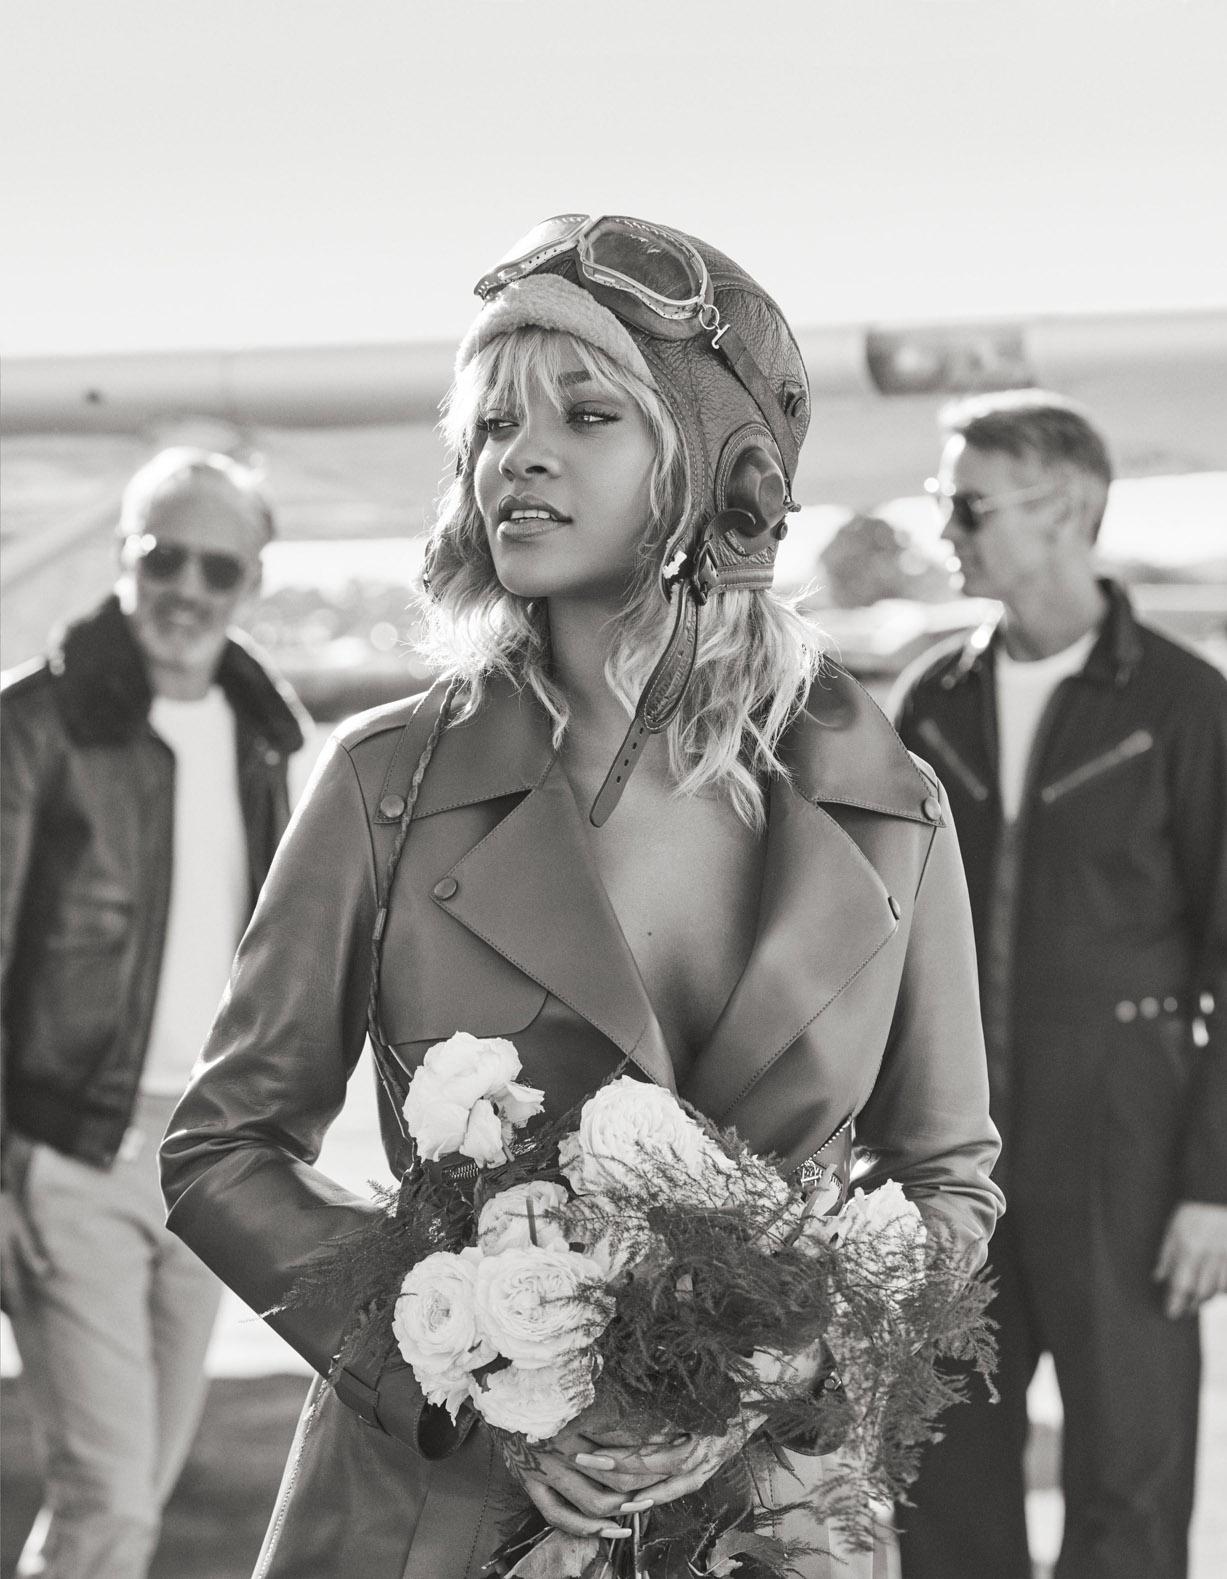 Летчица Рианна / Rihanna by Mariano Vivanco - Harper's Bazaar US march 2017